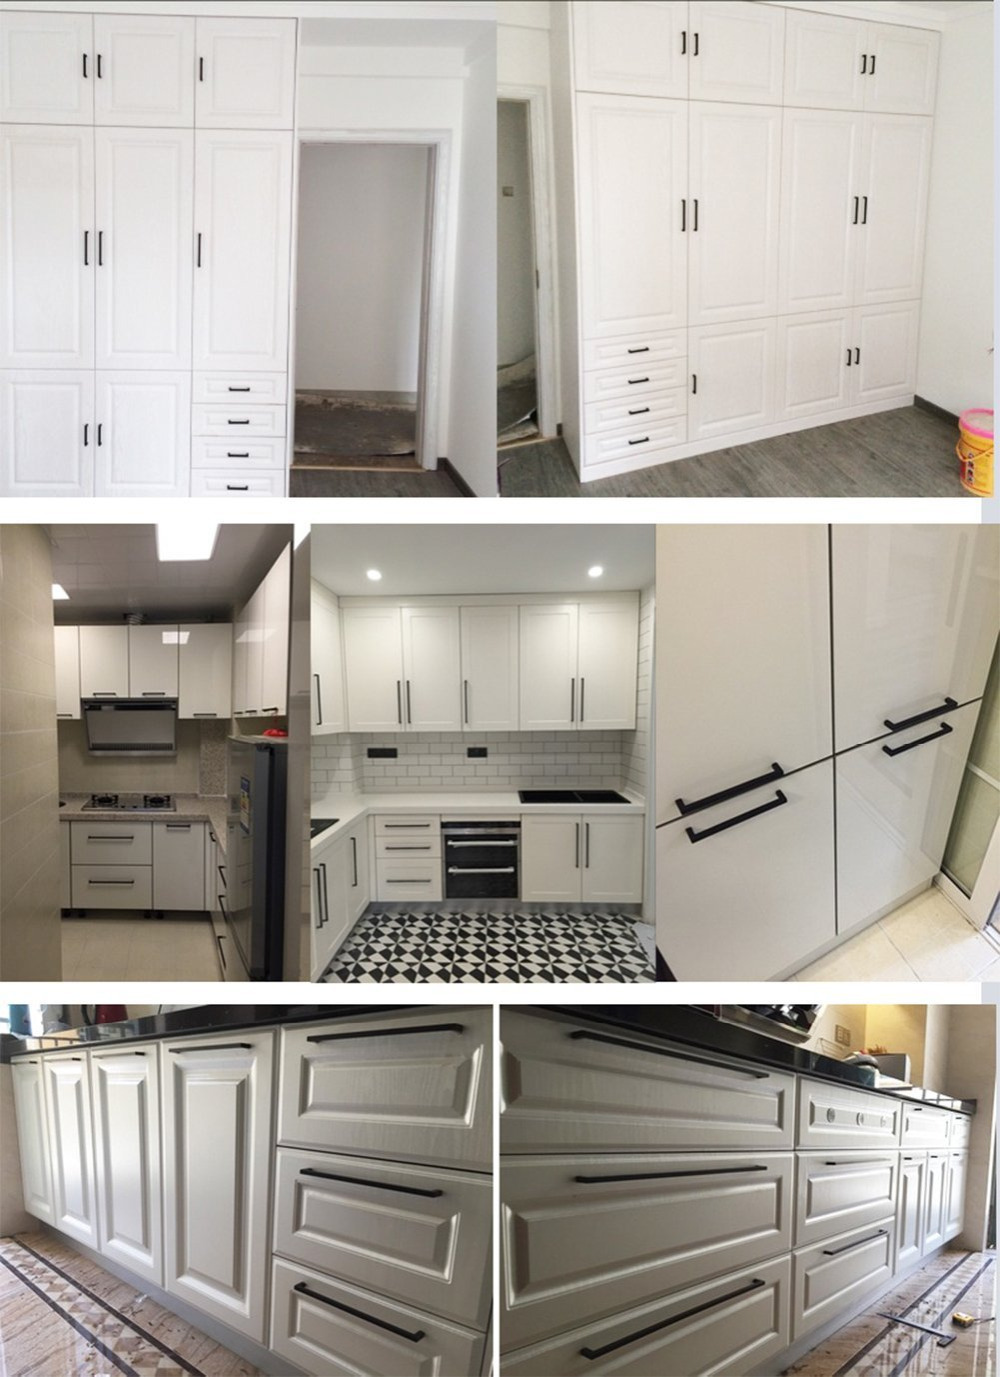 Kitchen Cabinet Door Handles Stainless Steel Black Square